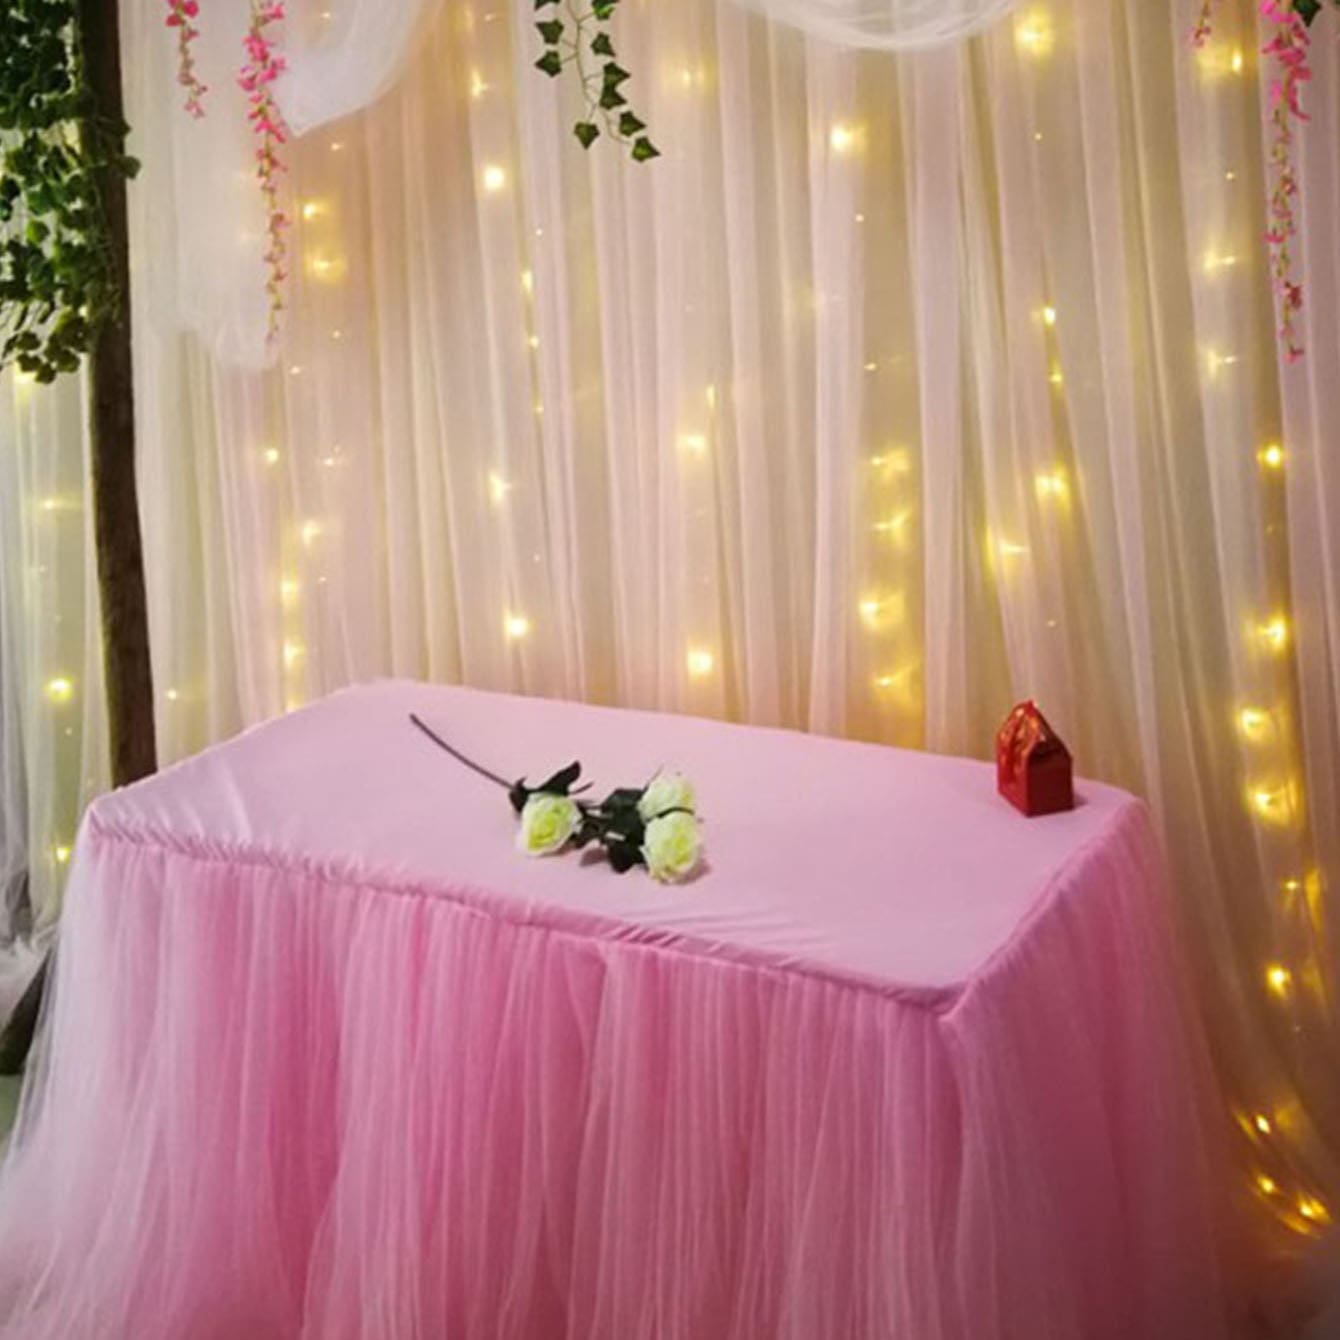 Effen bruiloft decoratief gaas 22M